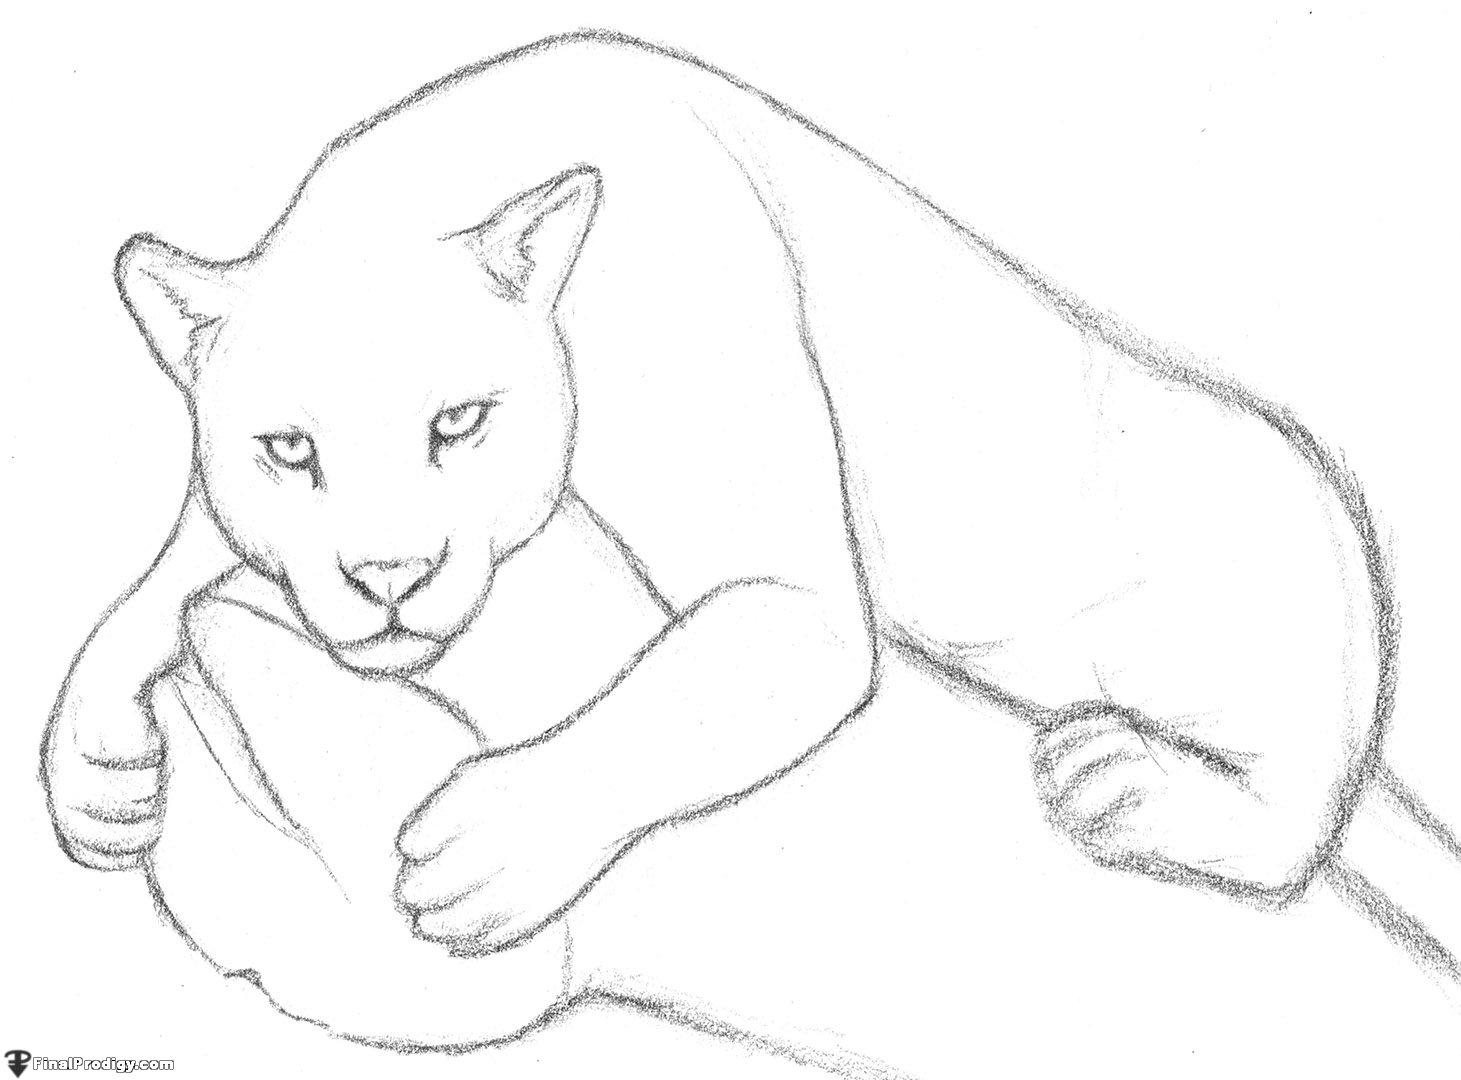 jaguar drawing - photo #16